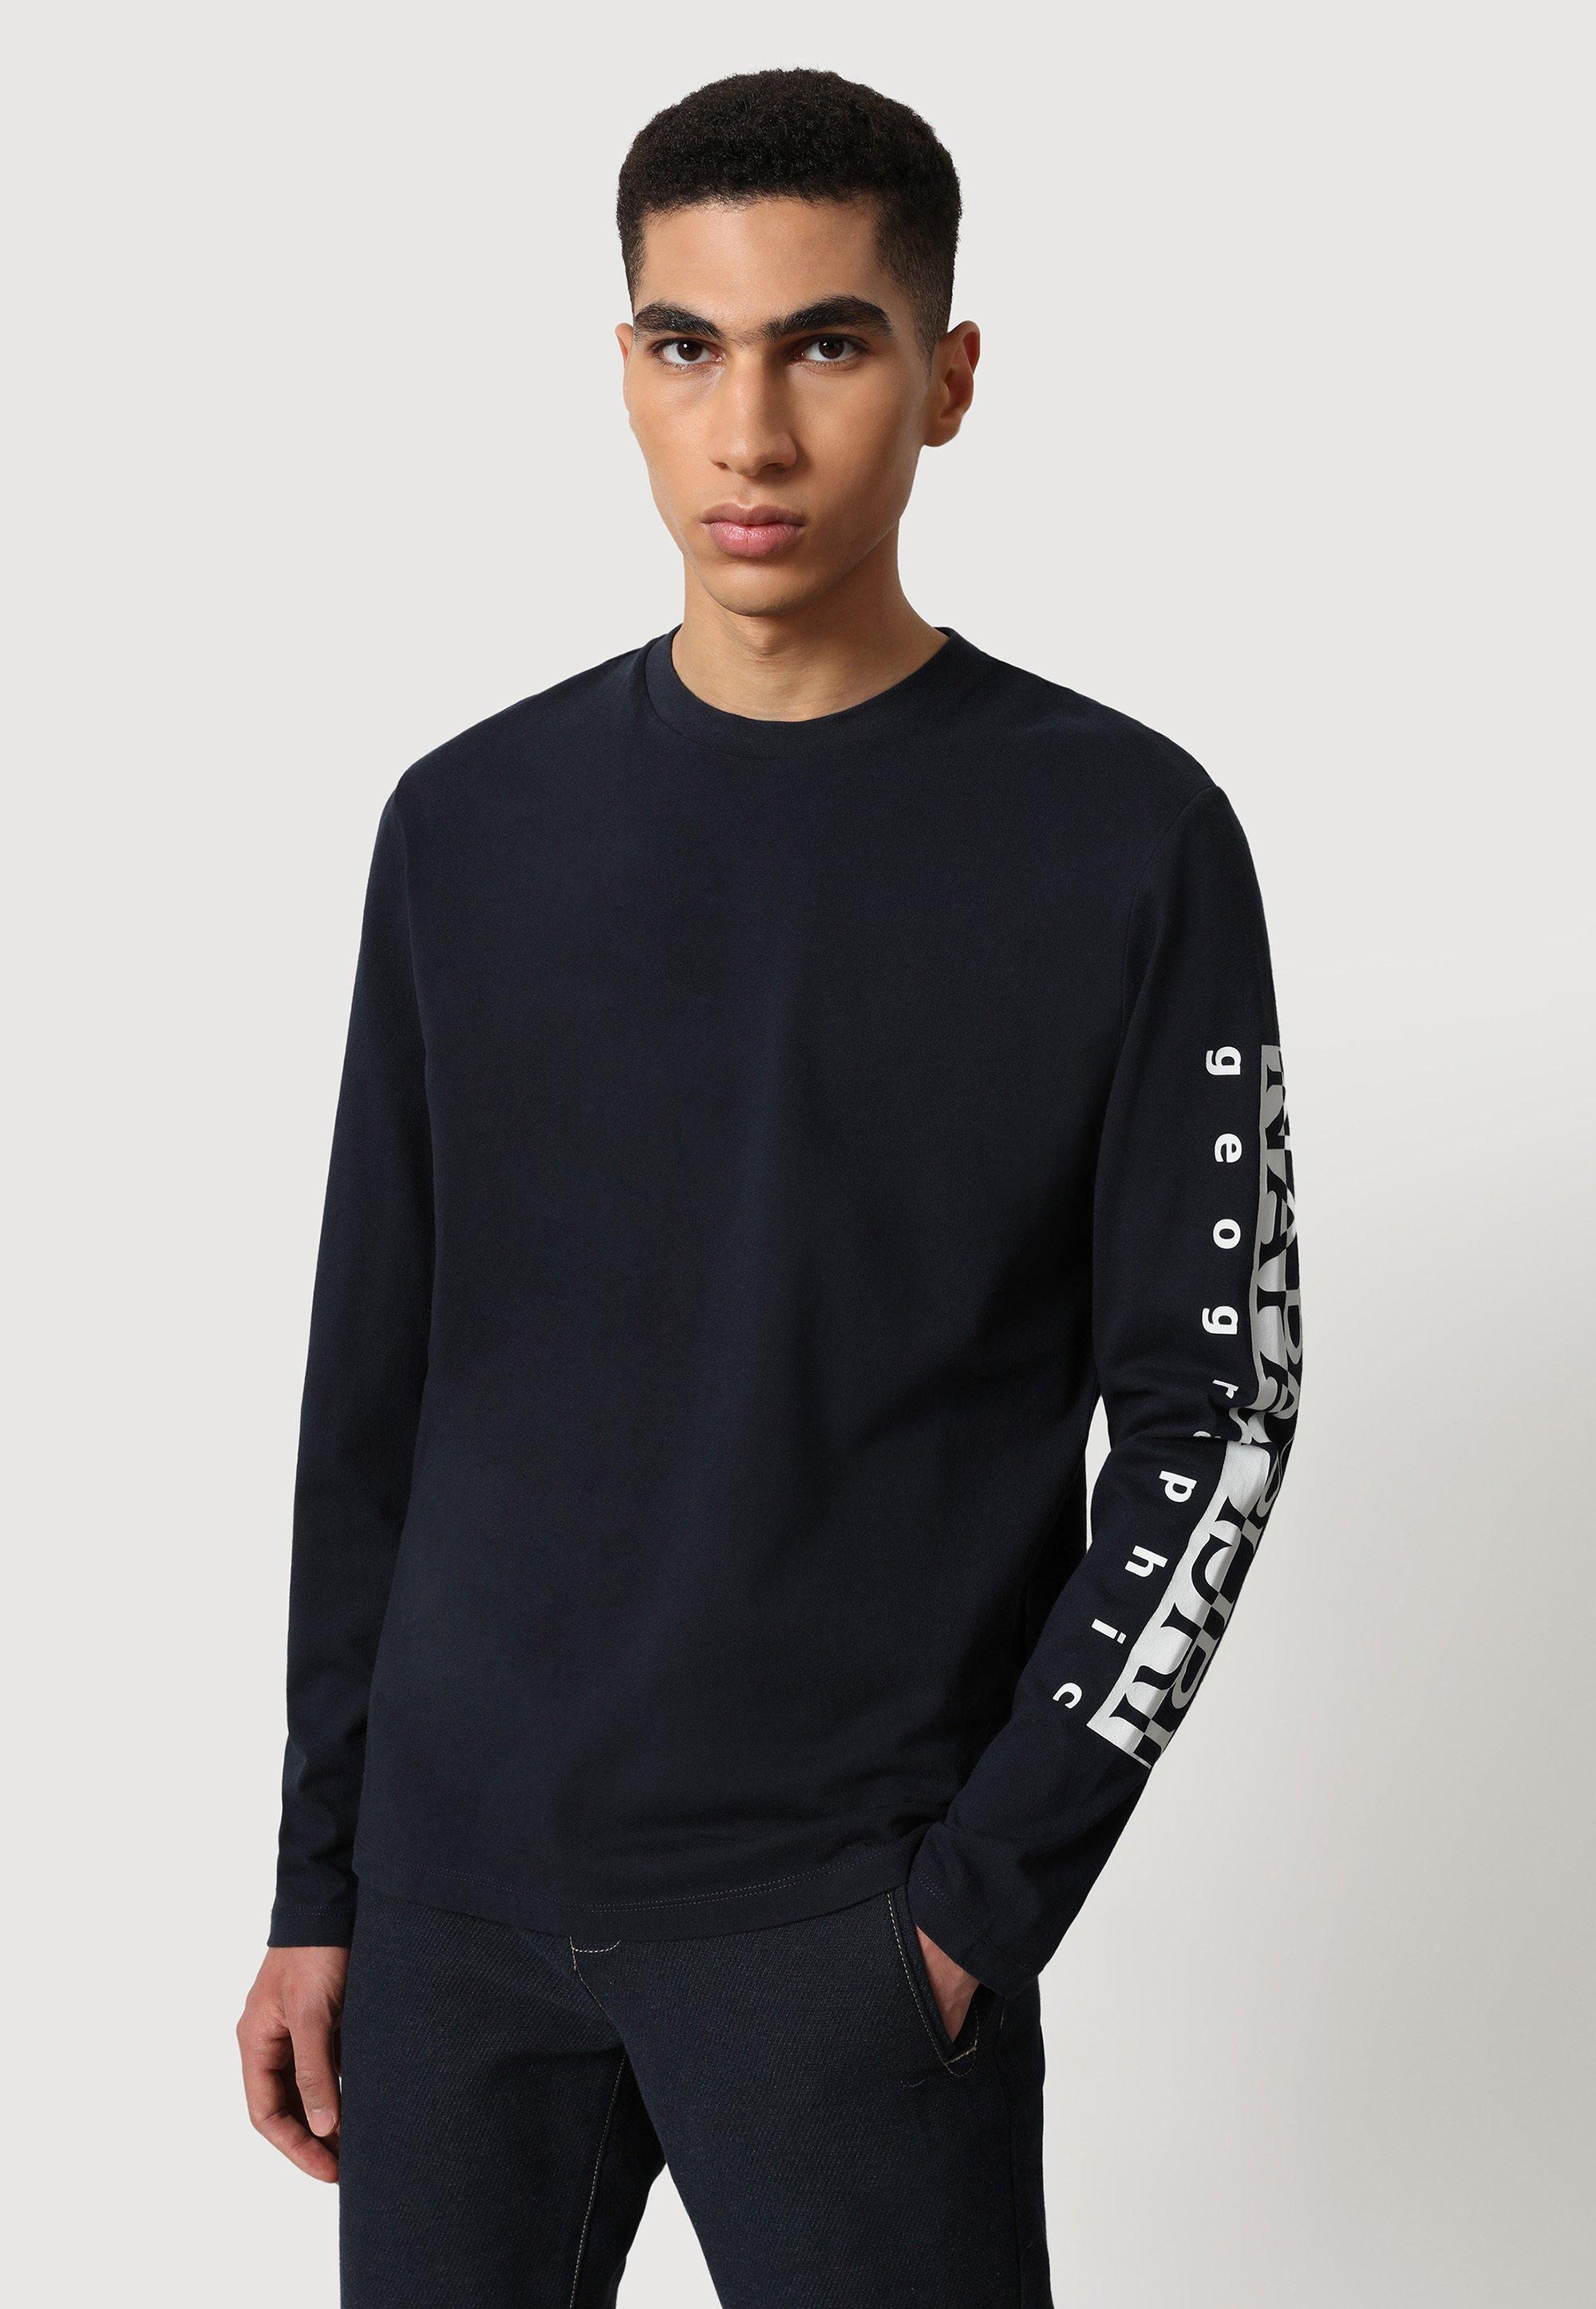 Uomo SADAS LS - Maglietta a manica lunga